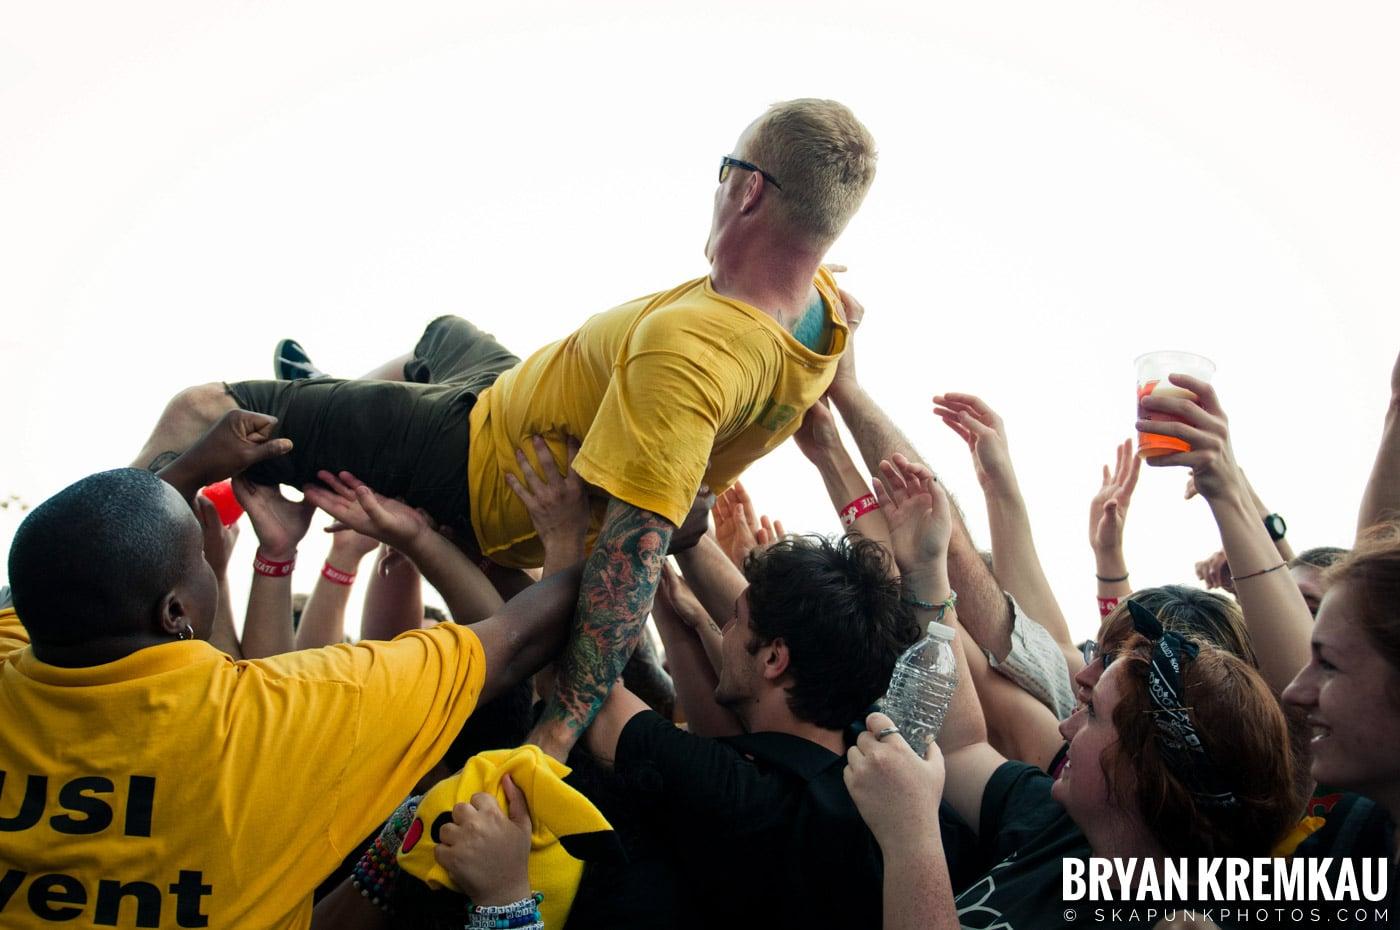 The Bronx @ Riot Fest 2012, Williamsburg Park NY - 9.8.12 (26)